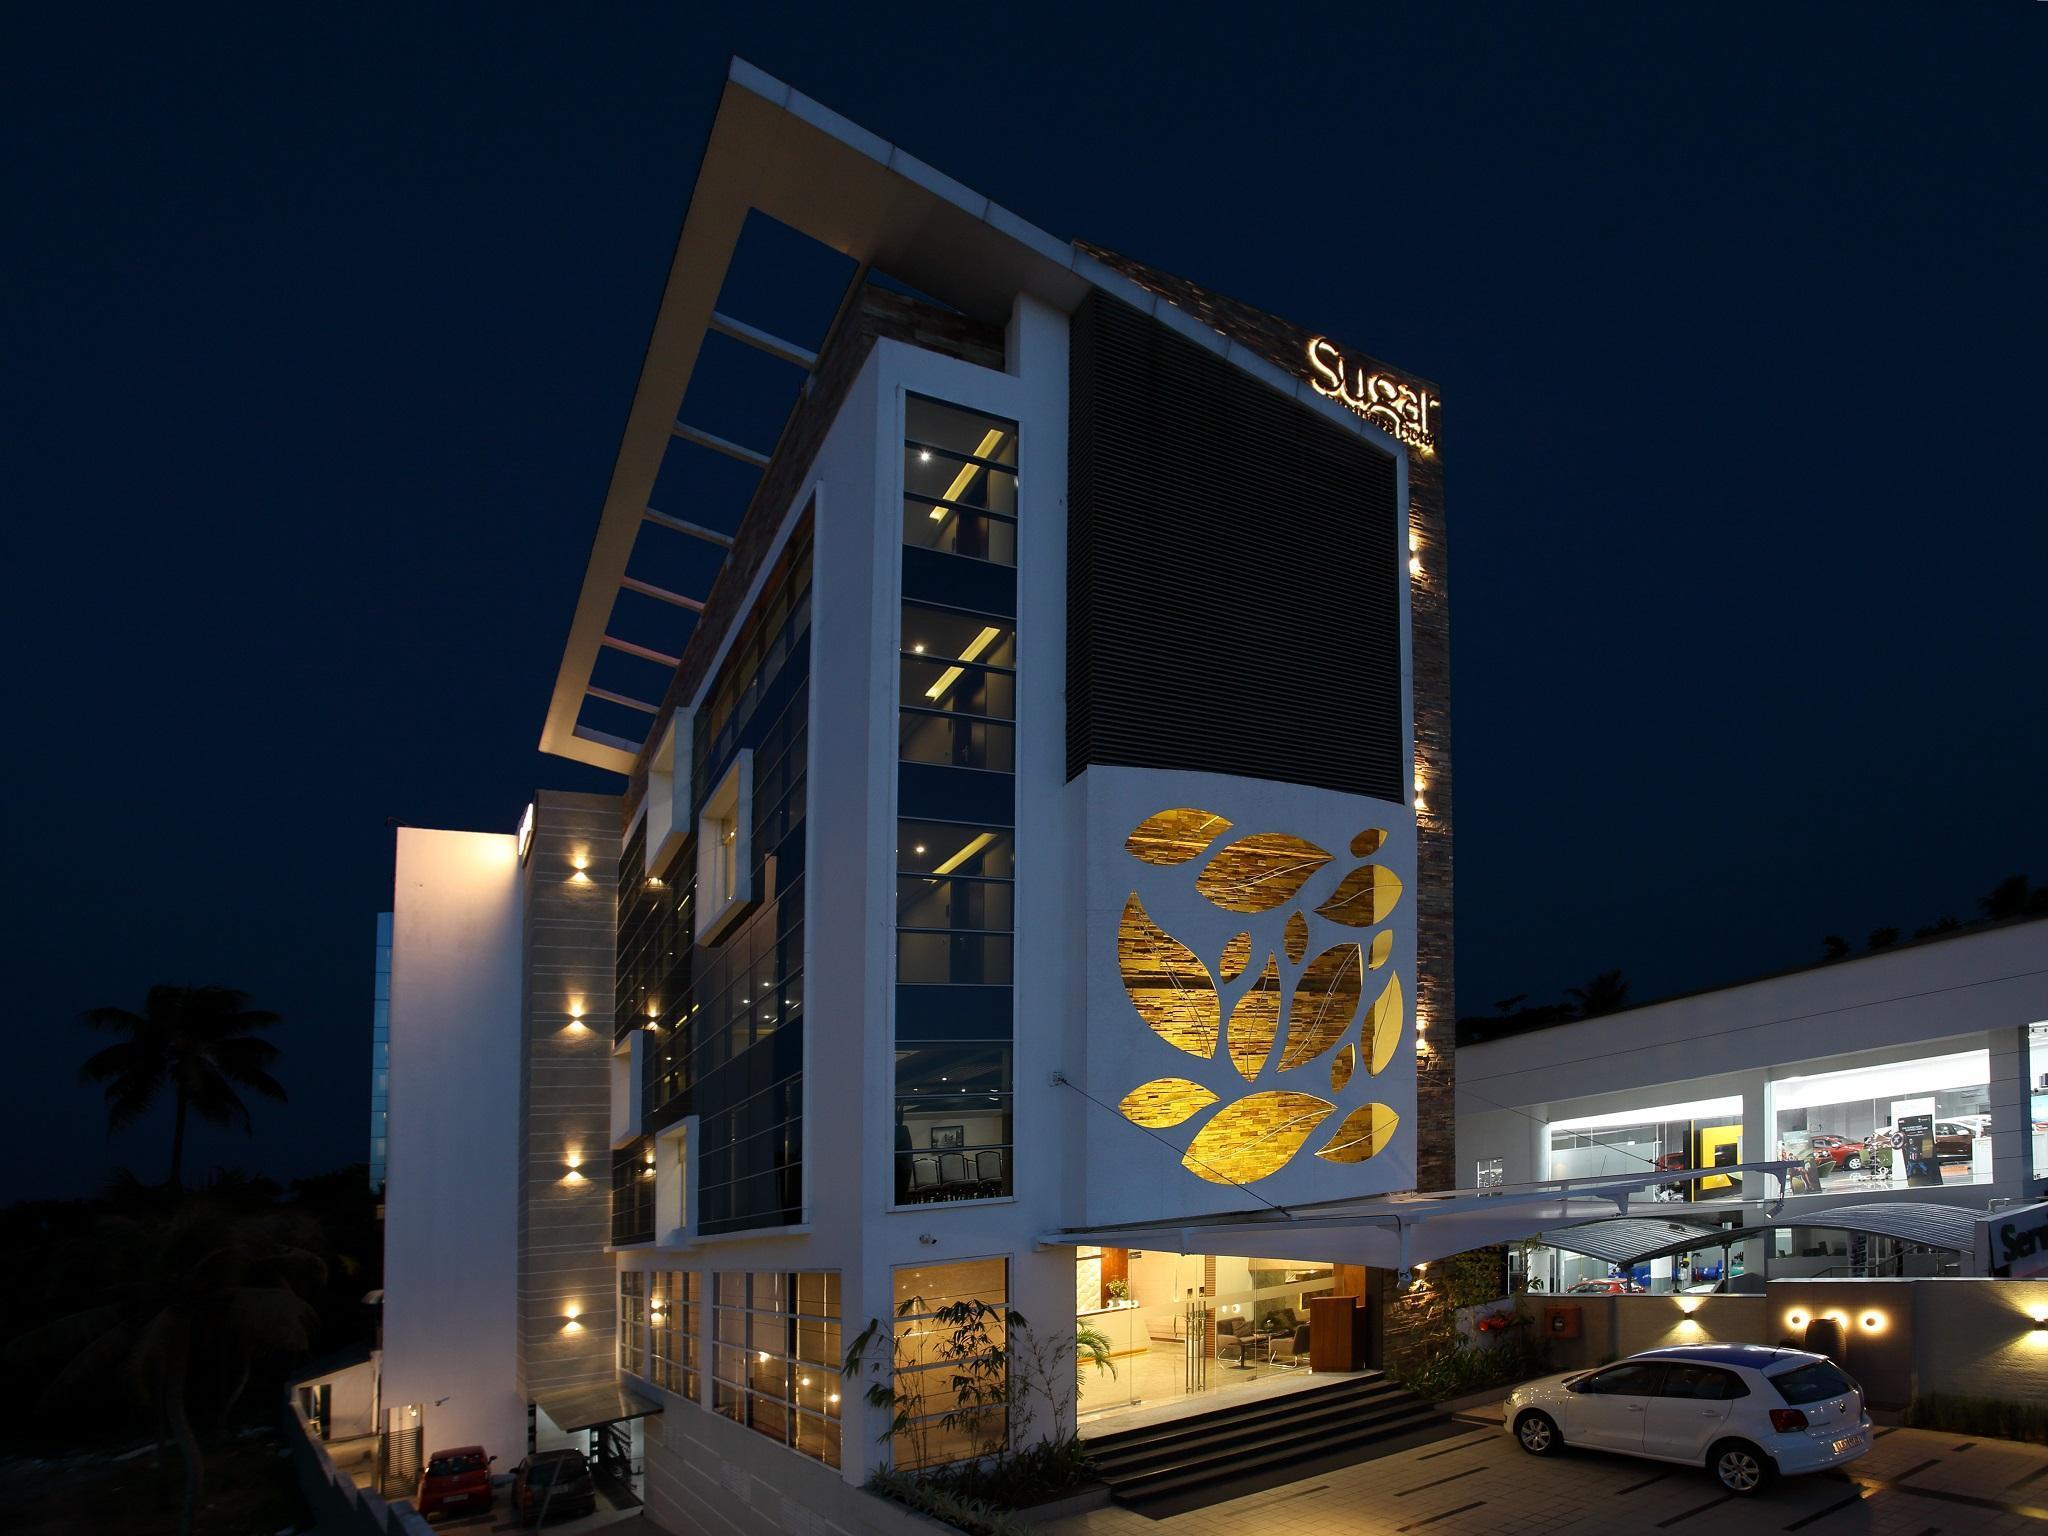 Sugar Business Hotel